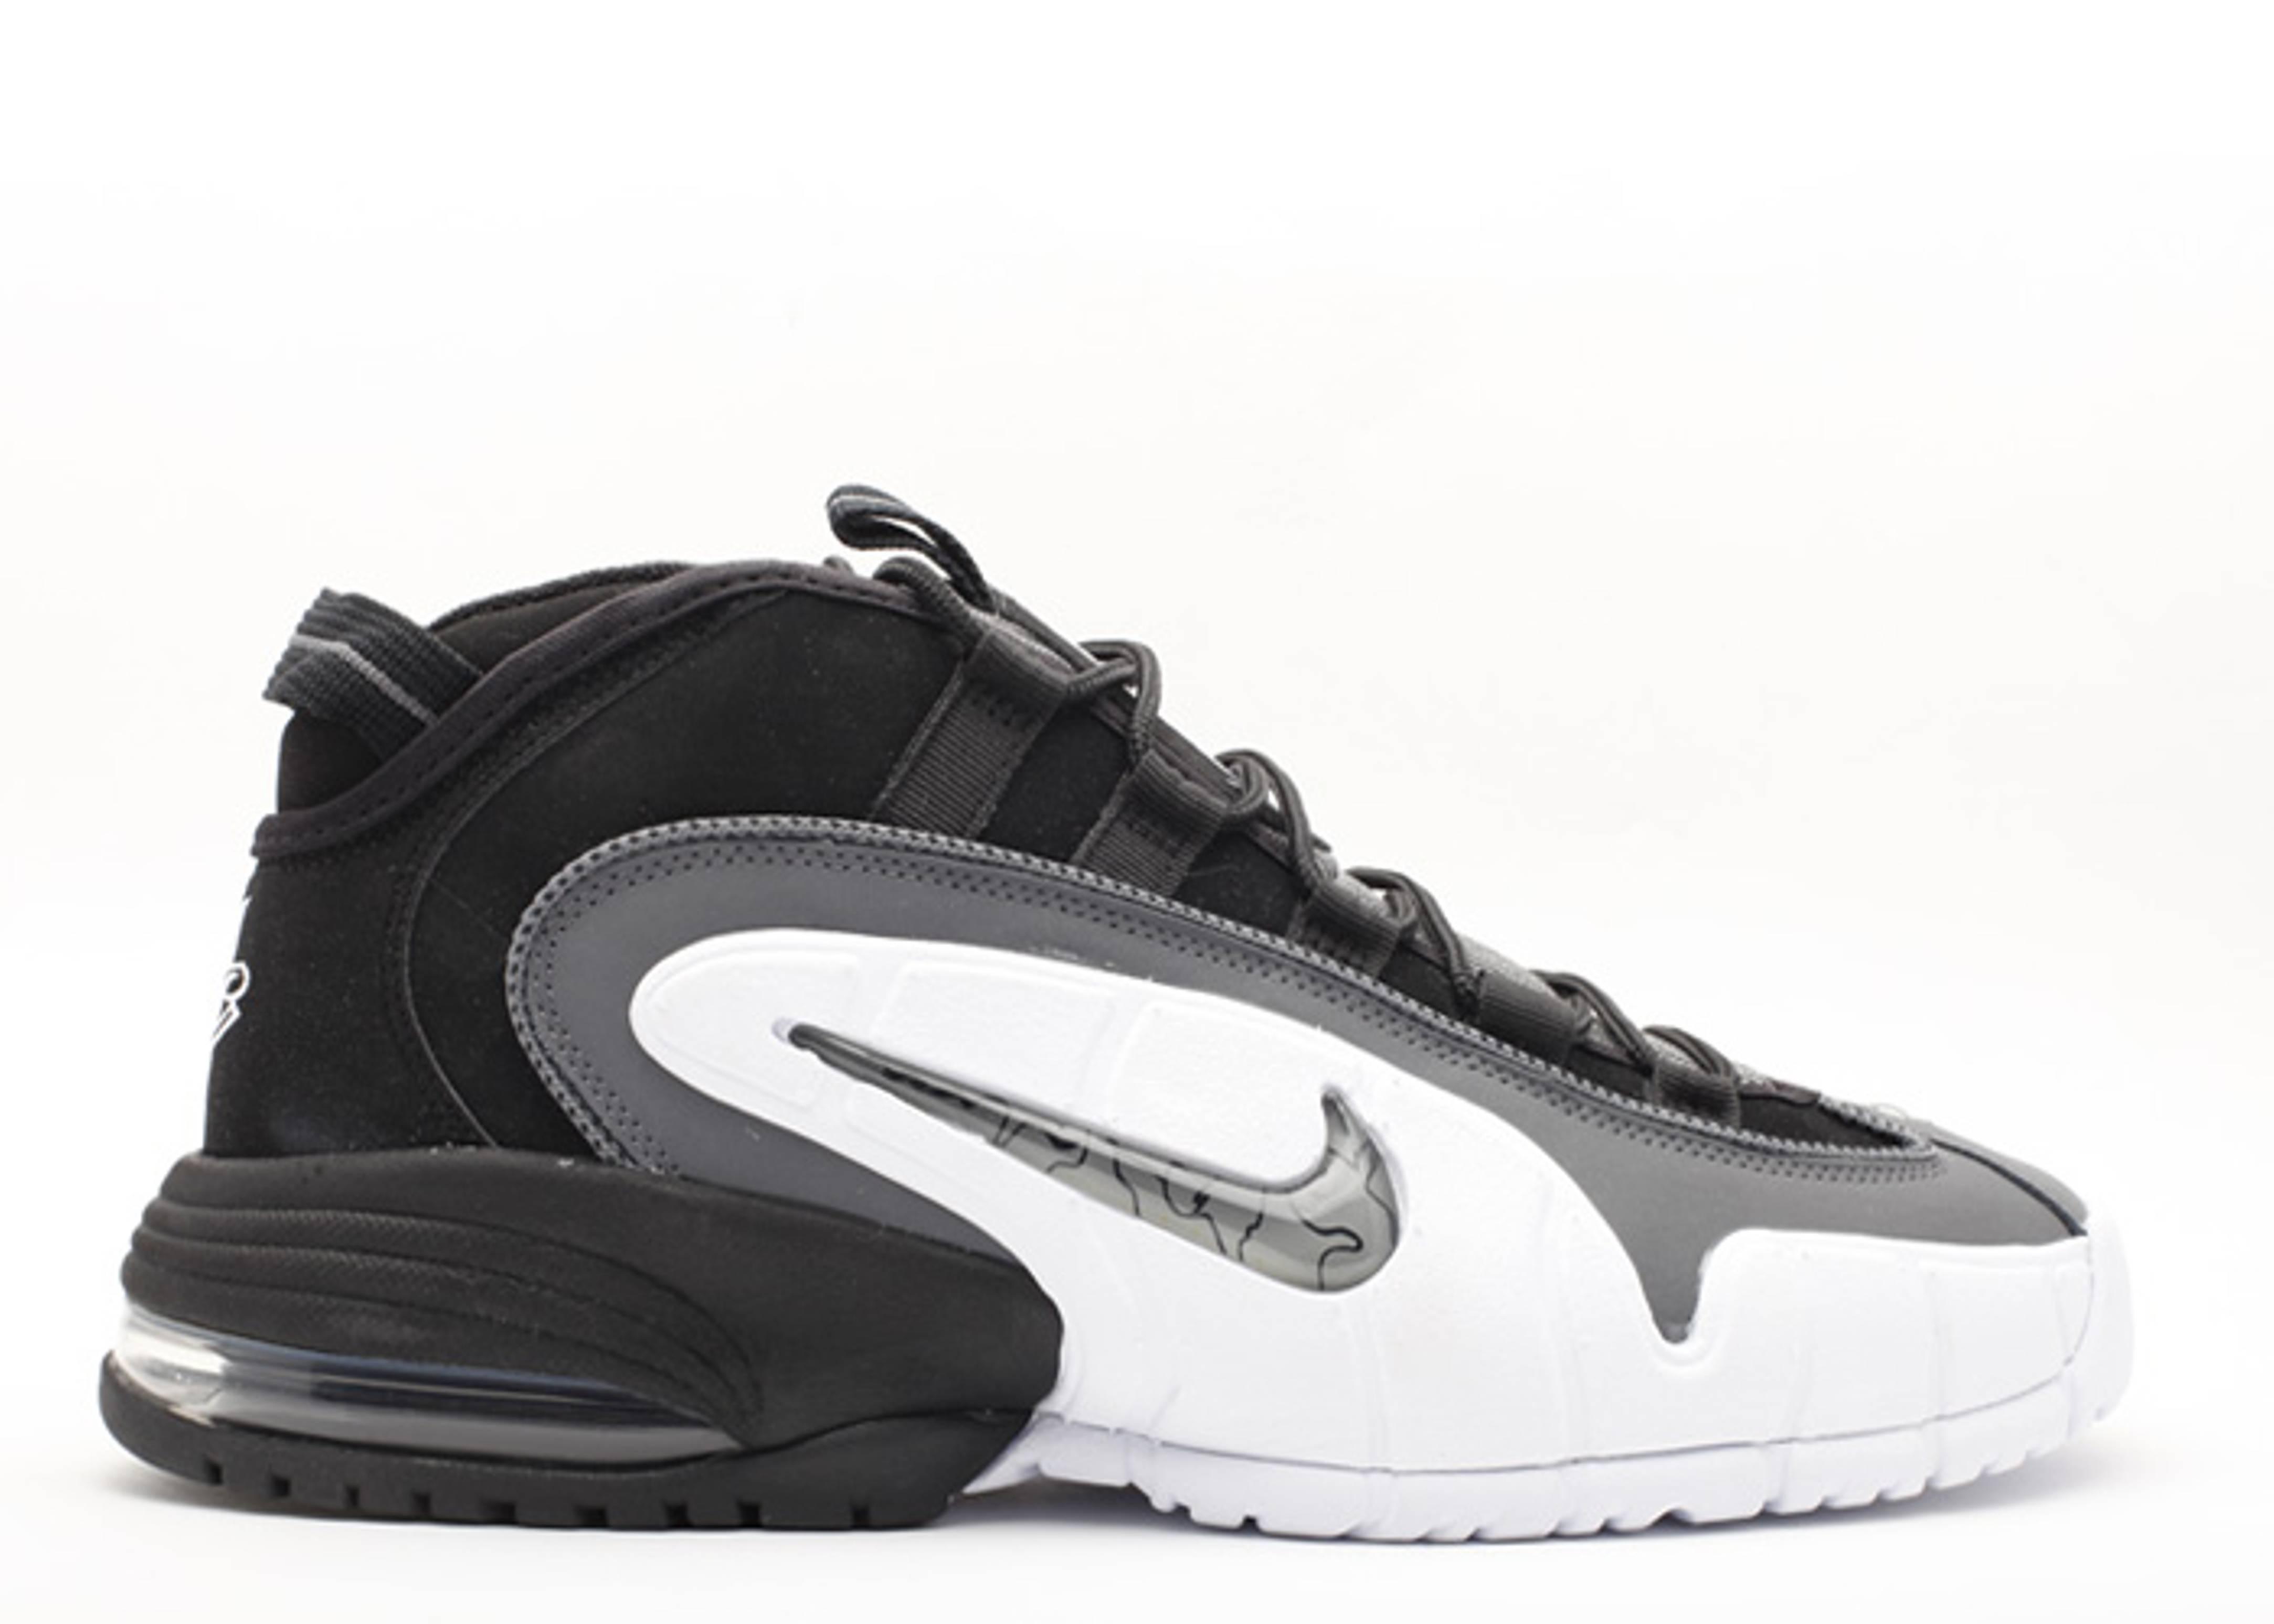 sale retailer 7909d 69ab5 Air Max Penny - Nike - 311089 004 - black dark grey-white   Flight Club